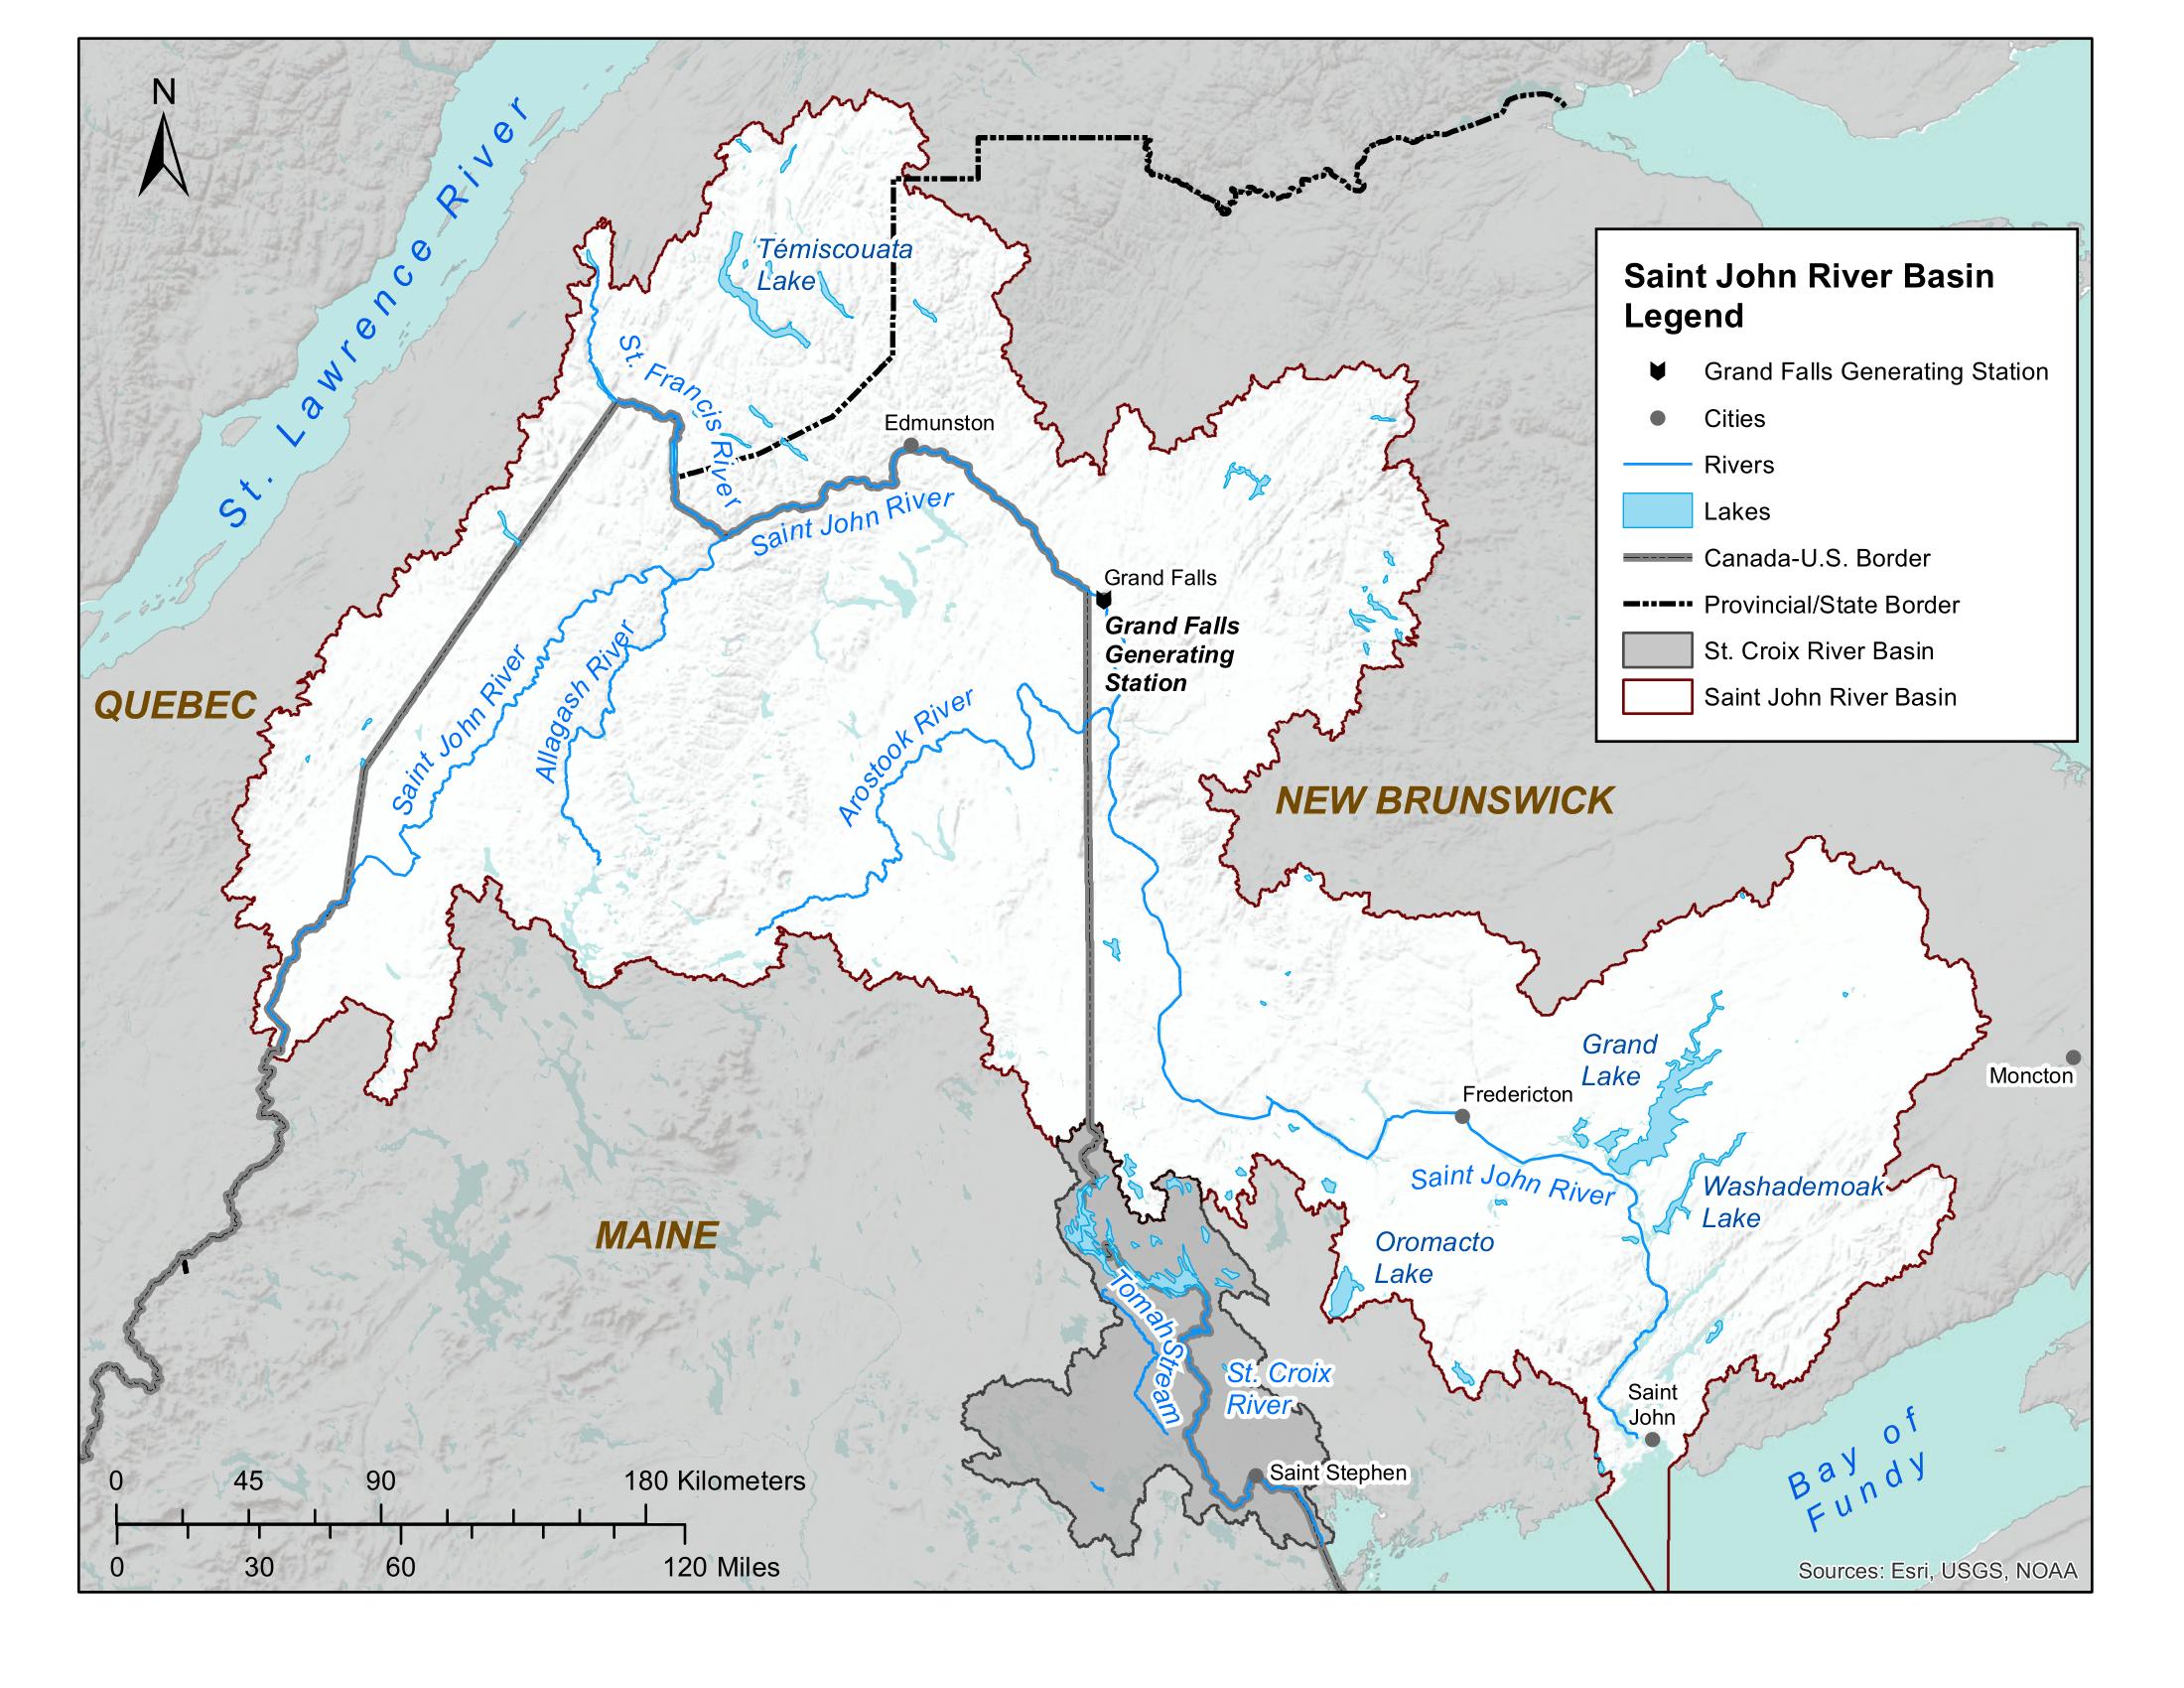 Map of Saint John River Basin